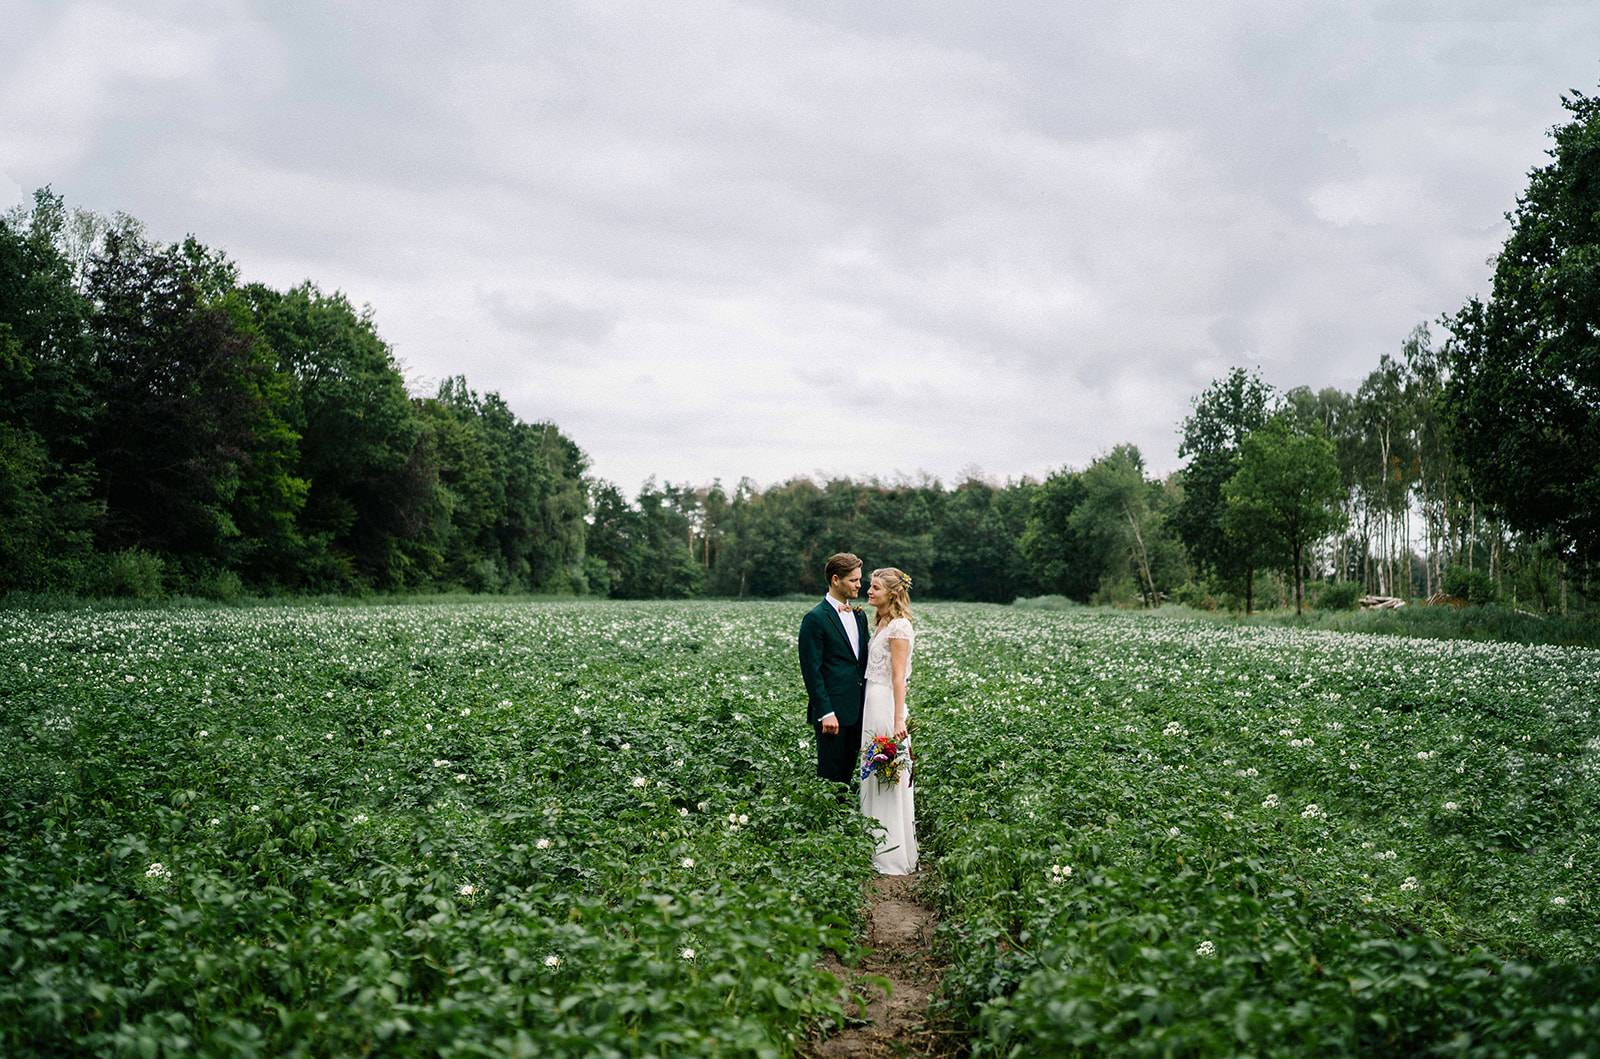 Hilde Eyckmans - MM-19b - House of Weddings